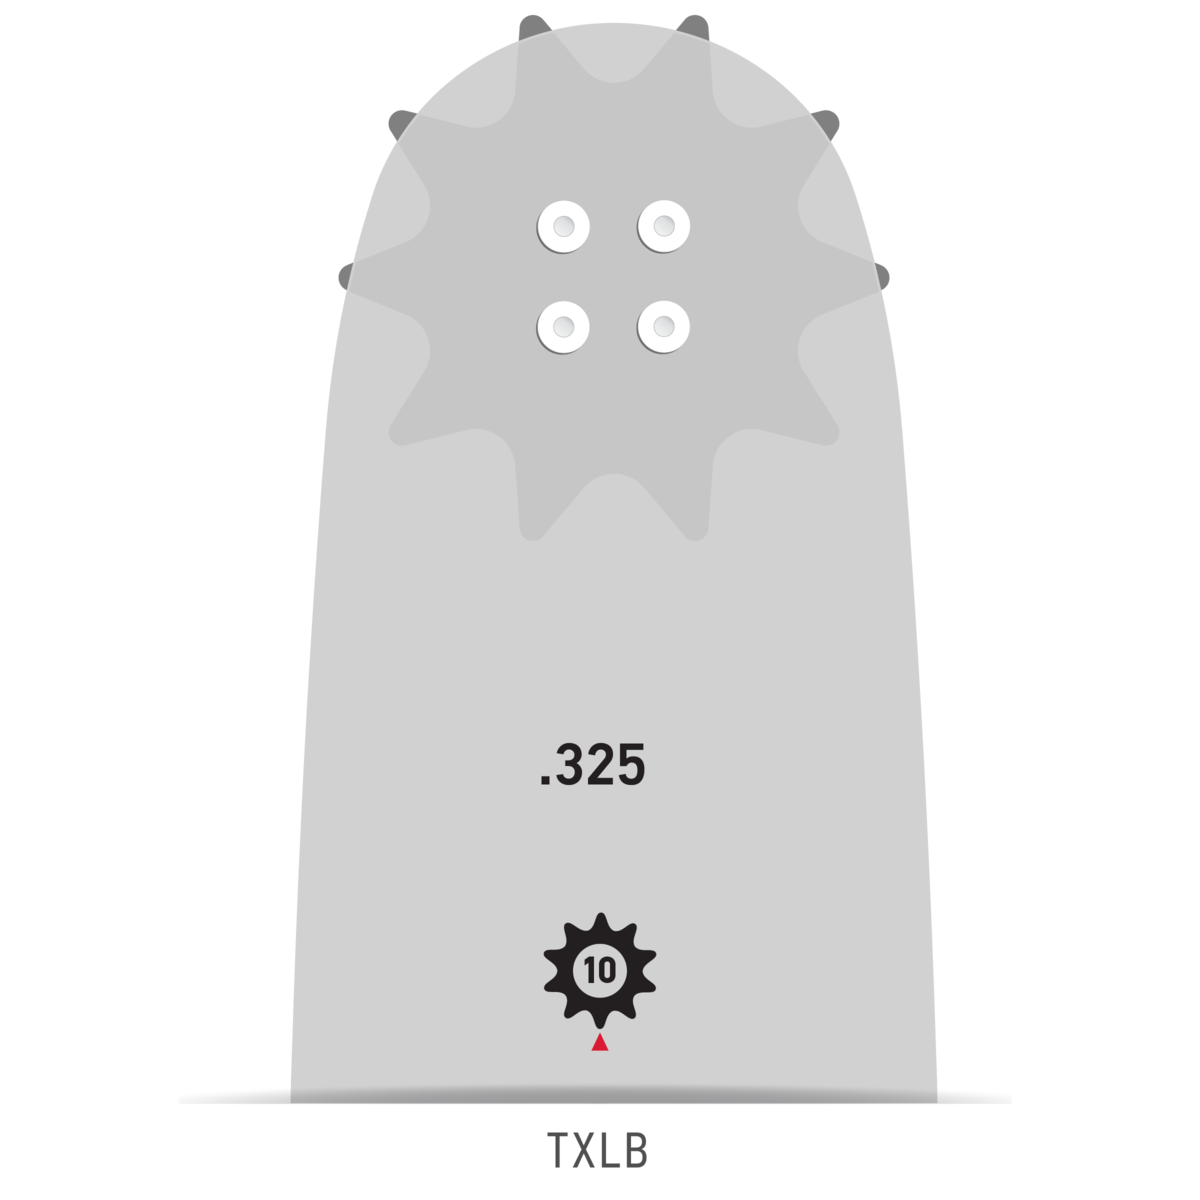 180TXLBK095